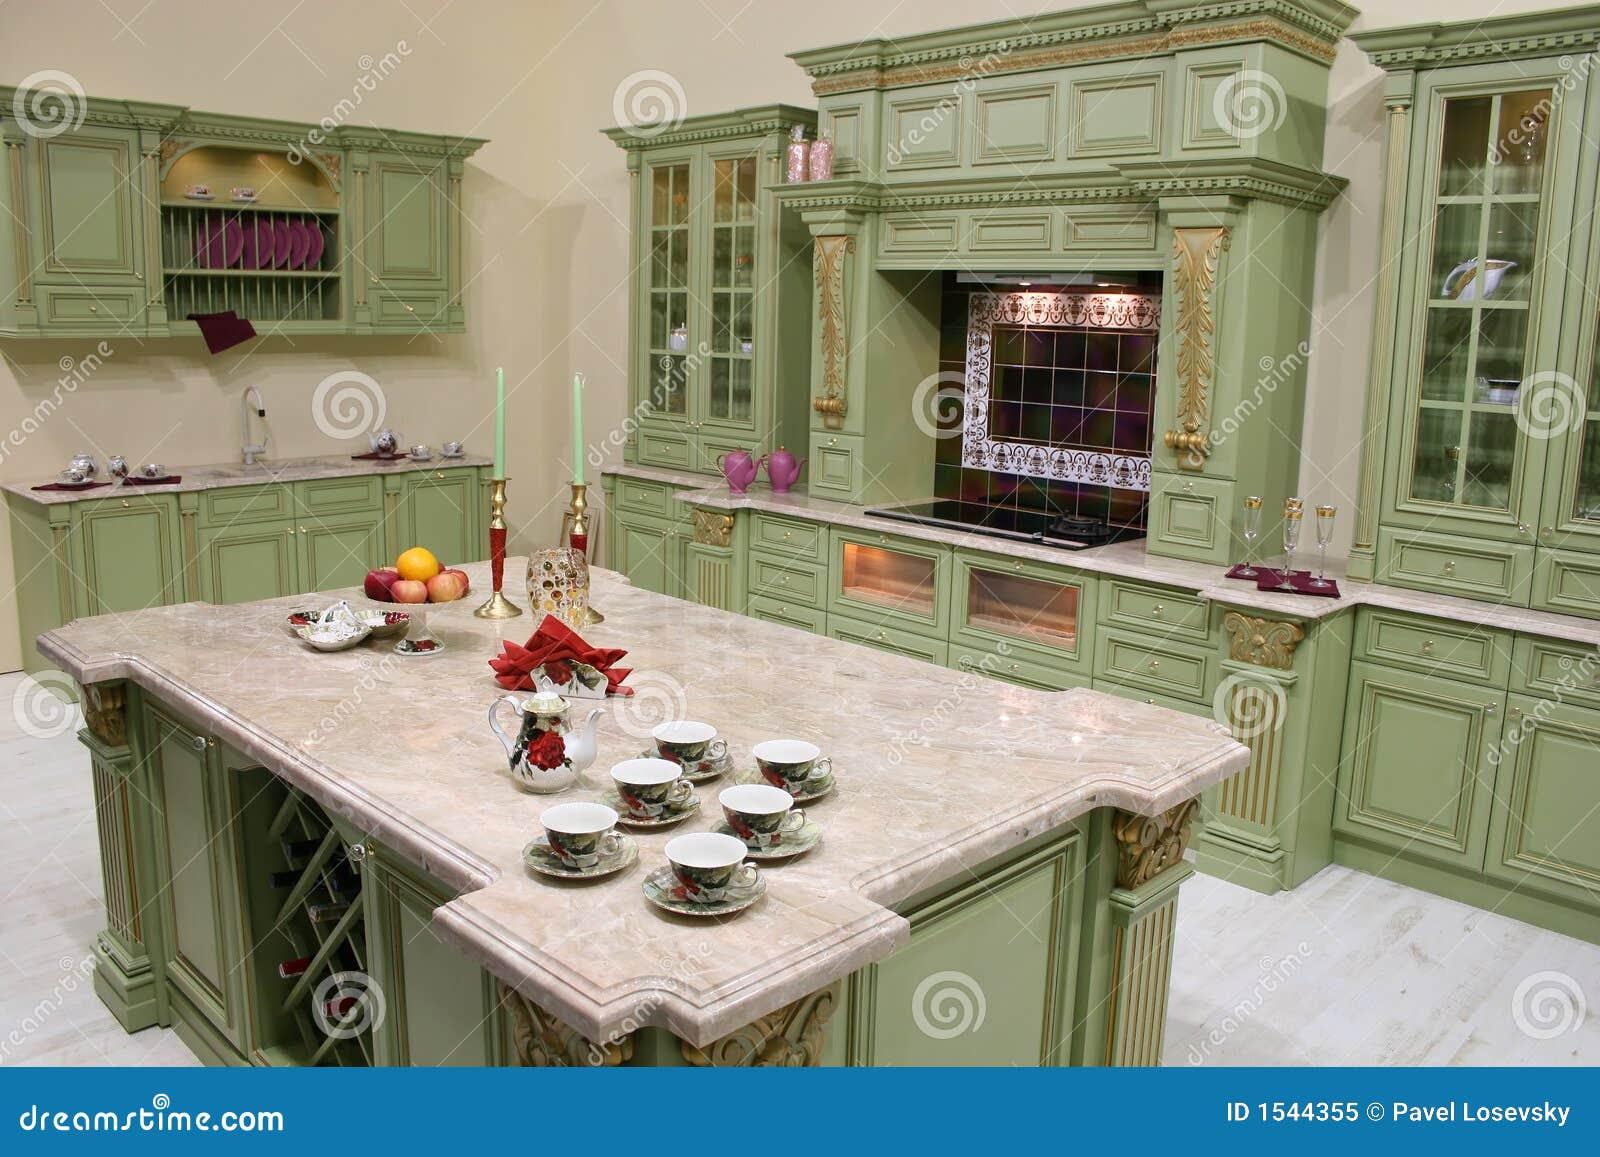 Luxury Kitchen Luxury Kitchen Royalty Free Stock Photo Image 1544355